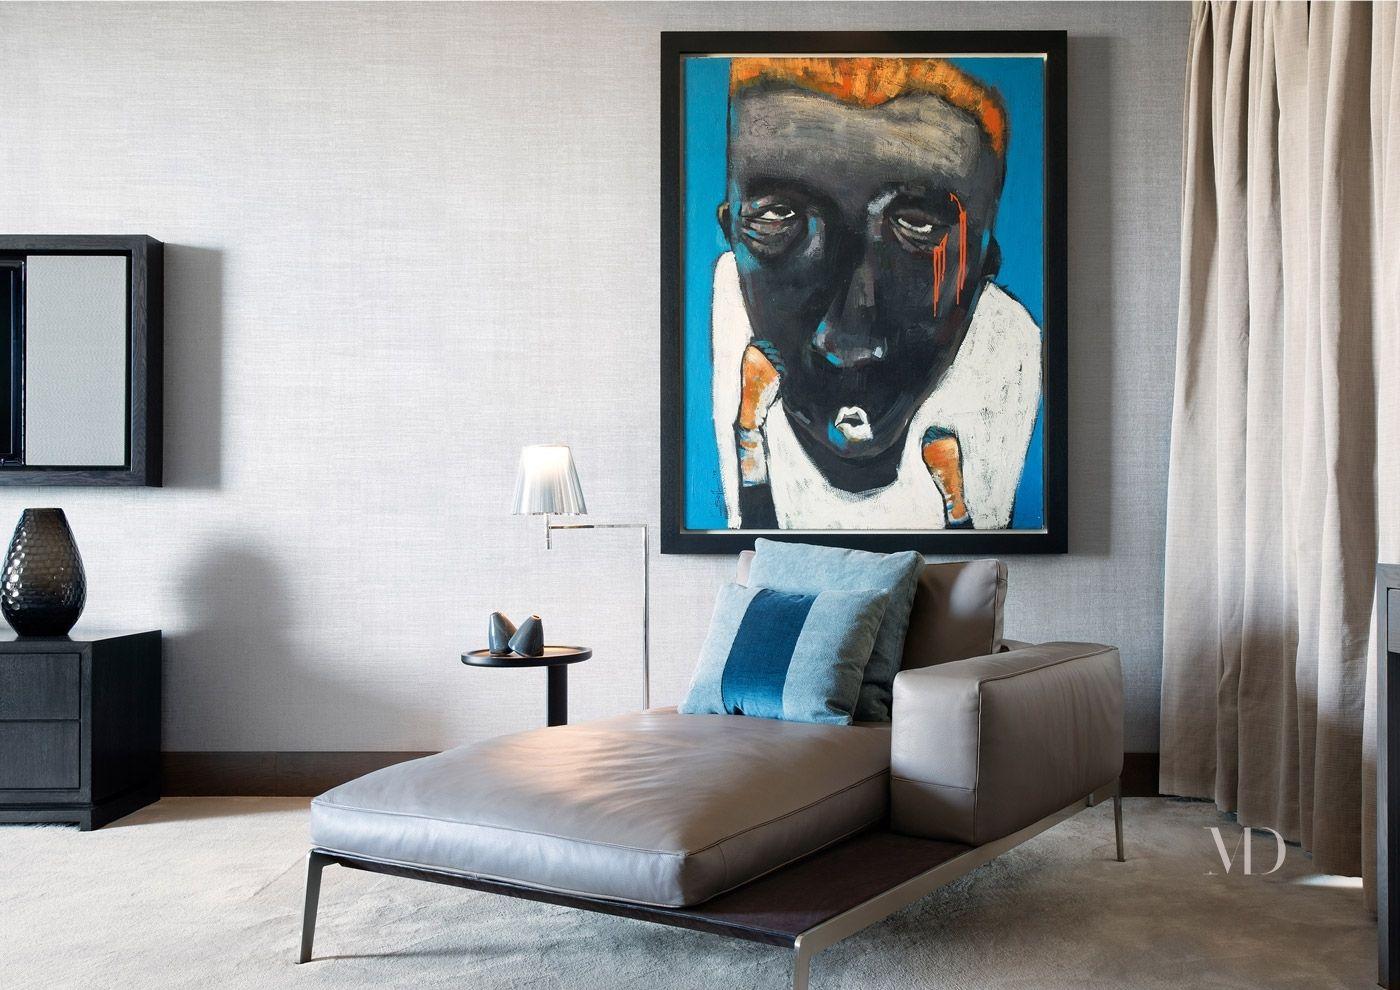 Rooms: P O R T F O L I O Trevor Square, Knightsbridge Carlton